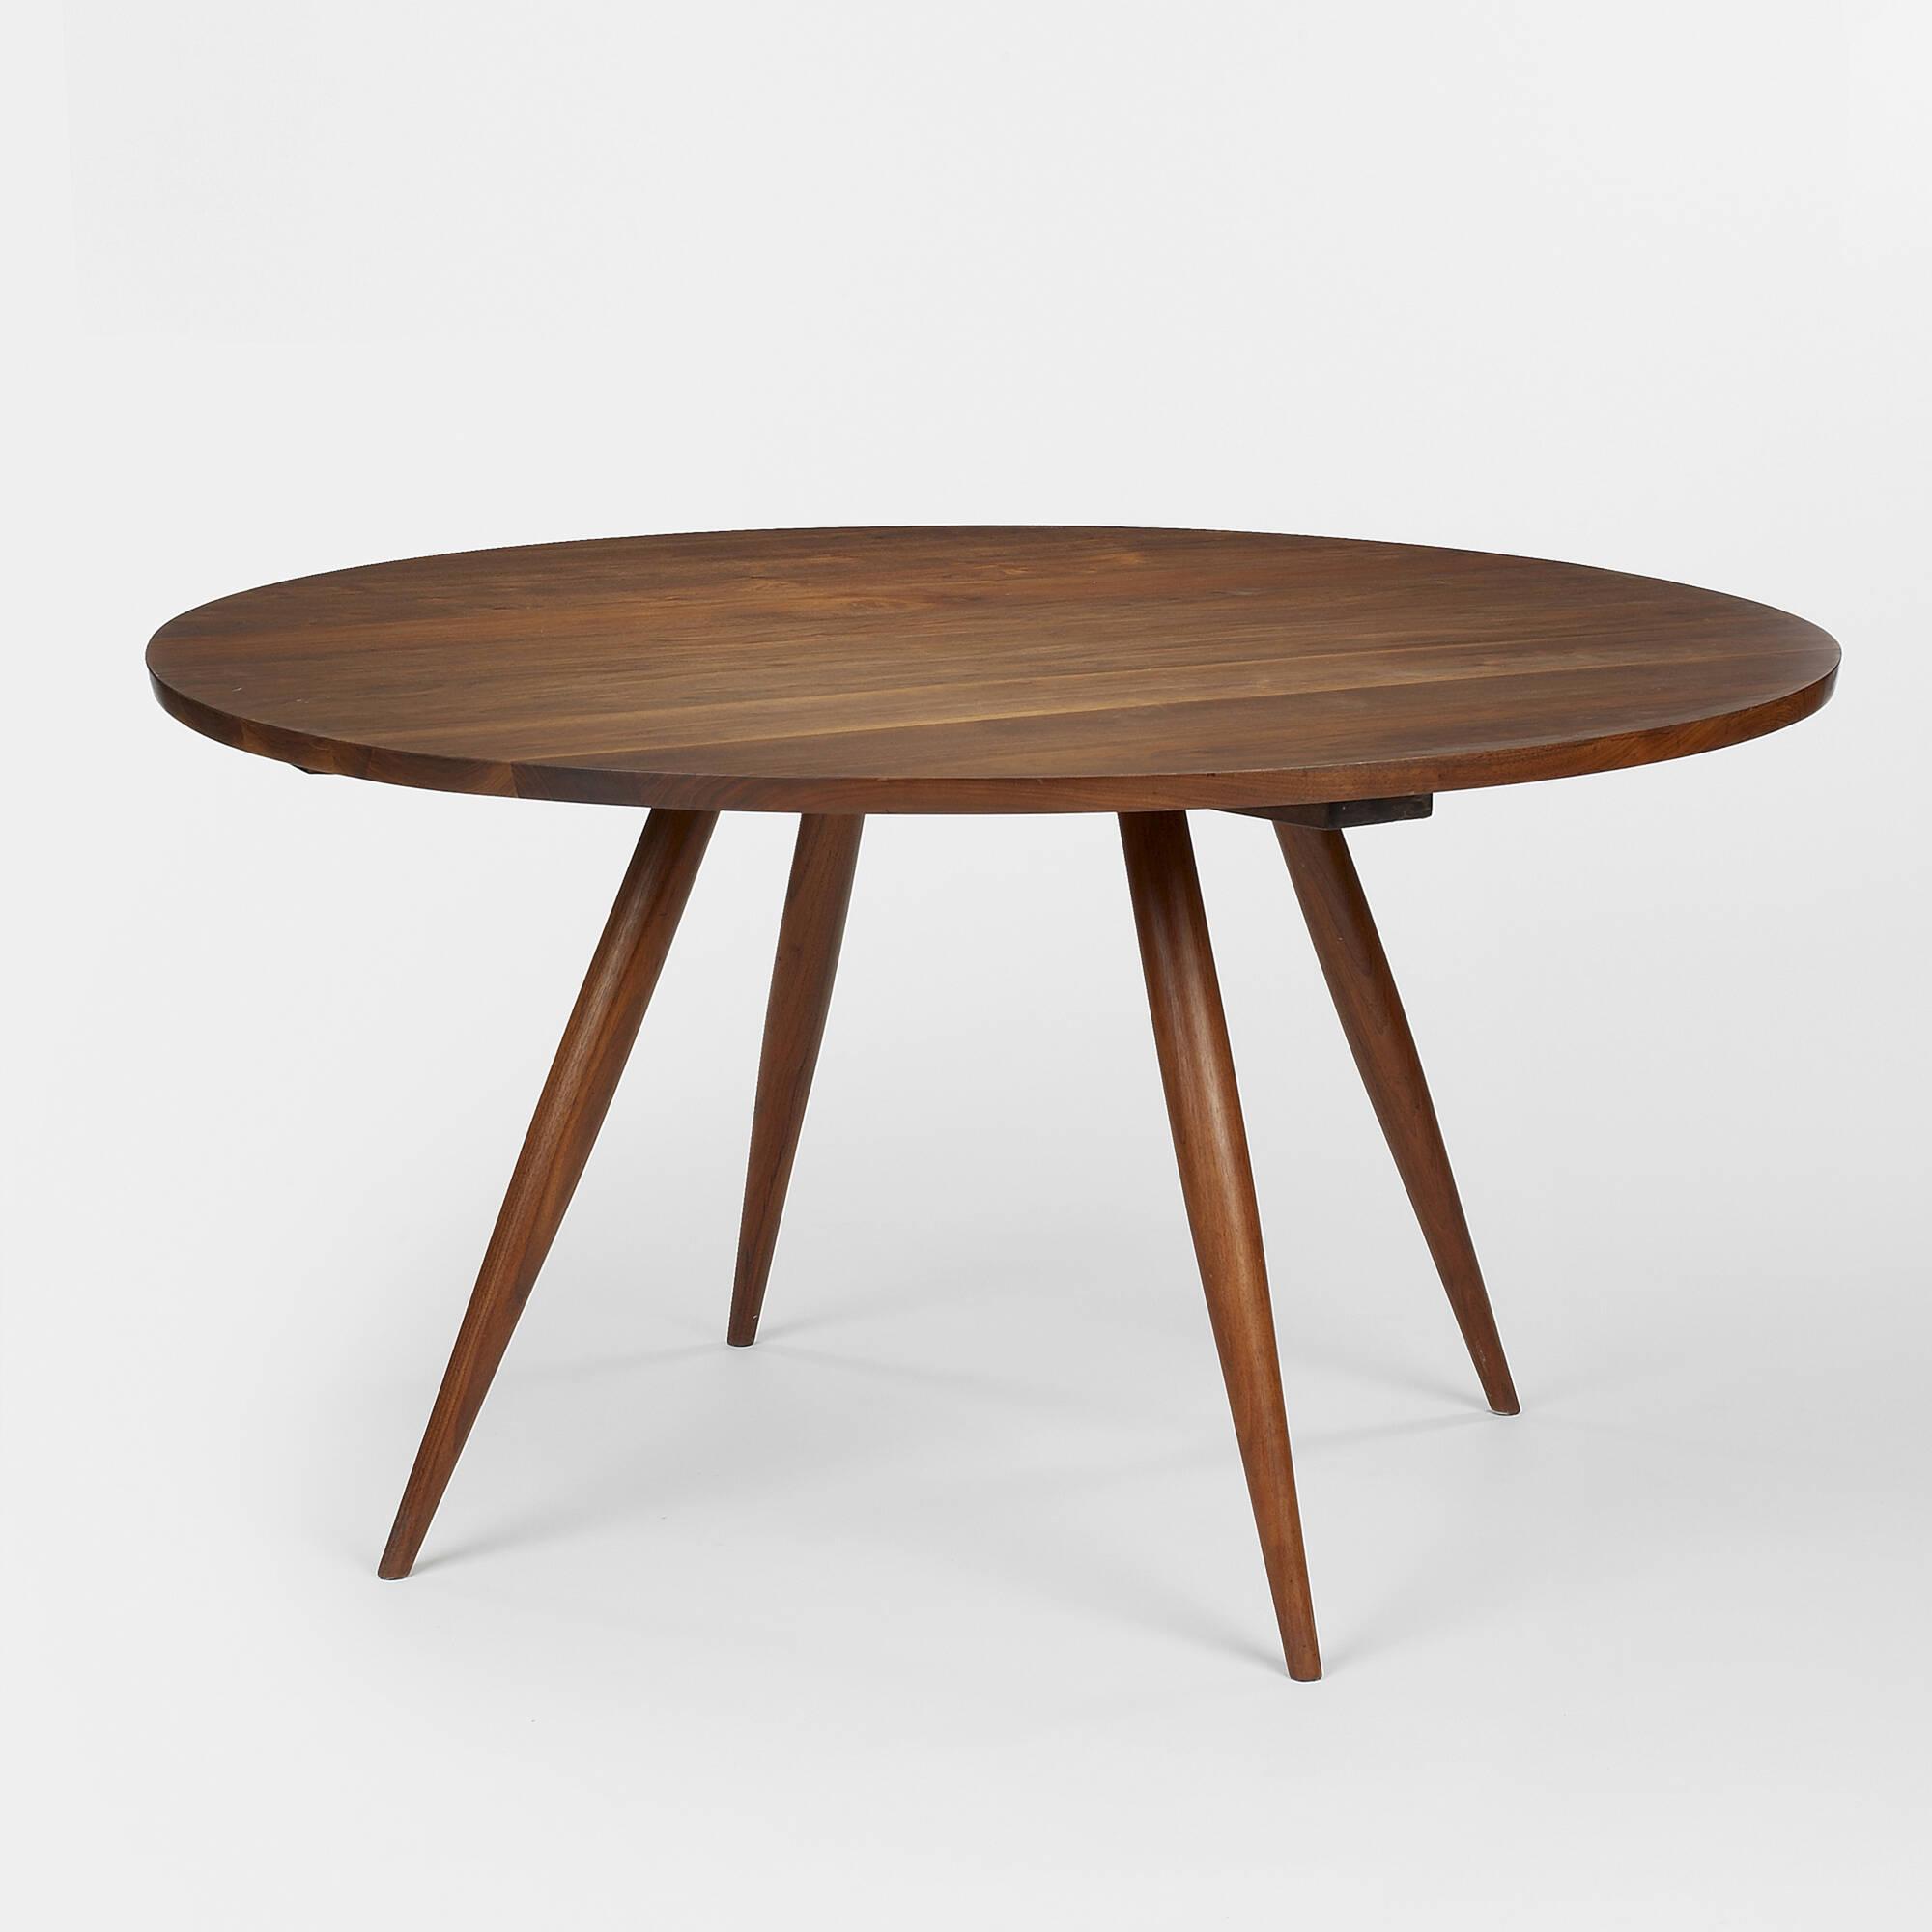 175 george nakashima round turned leg table for Email table design